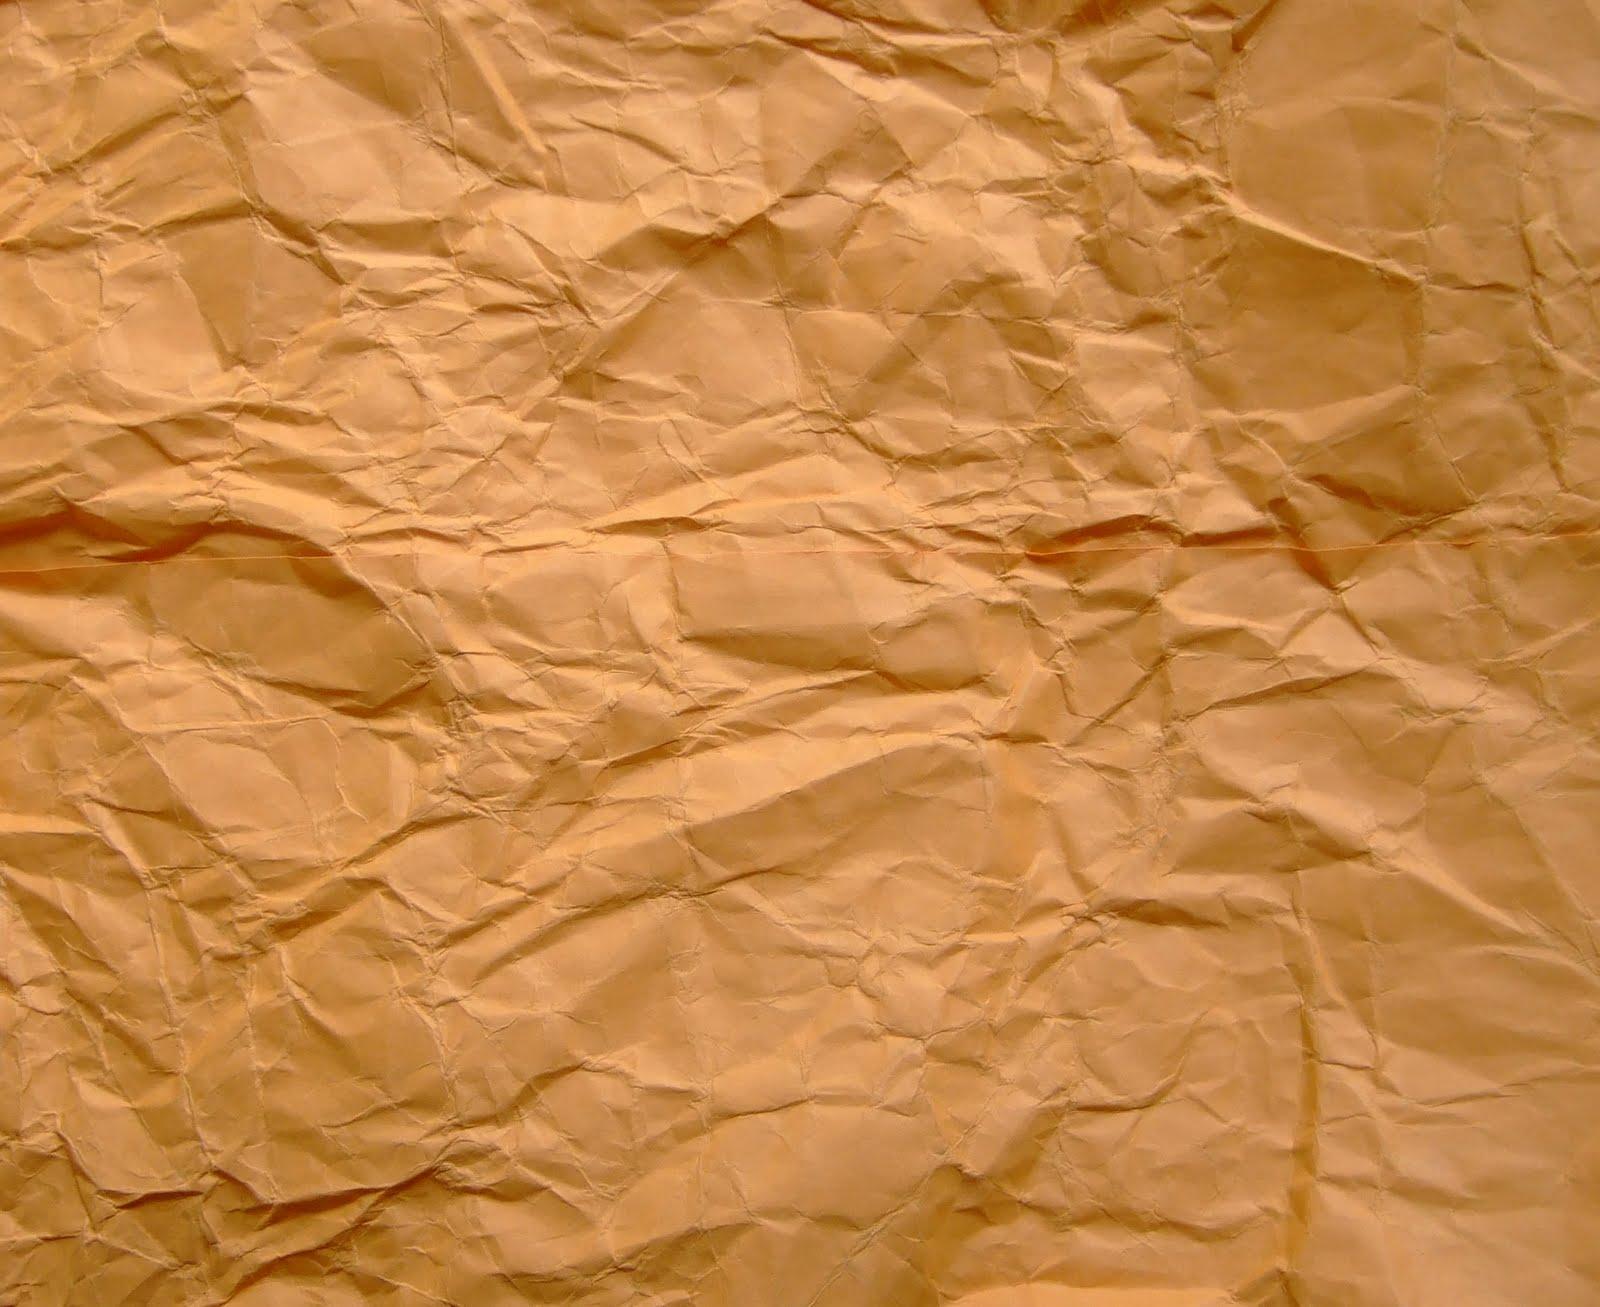 http://3.bp.blogspot.com/_ZeQpZiHbg3U/THmCtGzb5HI/AAAAAAAACzU/sWBypbIsIo8/s1600/Paper_Texture_by_Spiteful_Pie_Stock.jpg